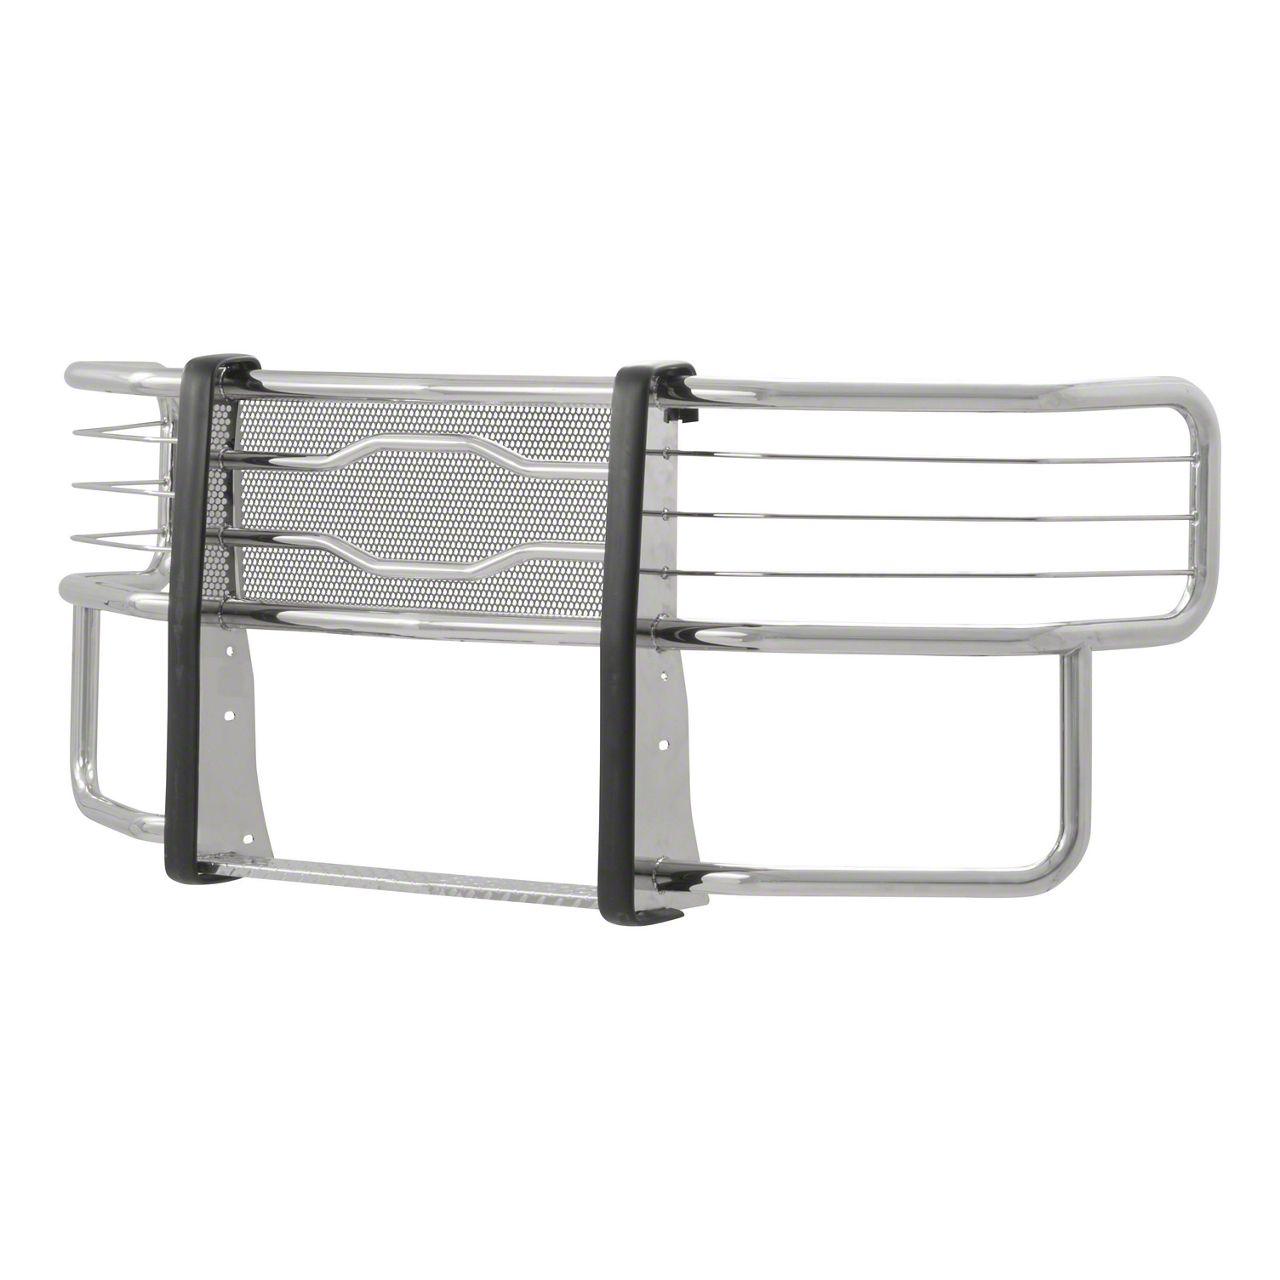 Luverne Prowler Max Grille Guard - Black (14-15 Silverado 1500)